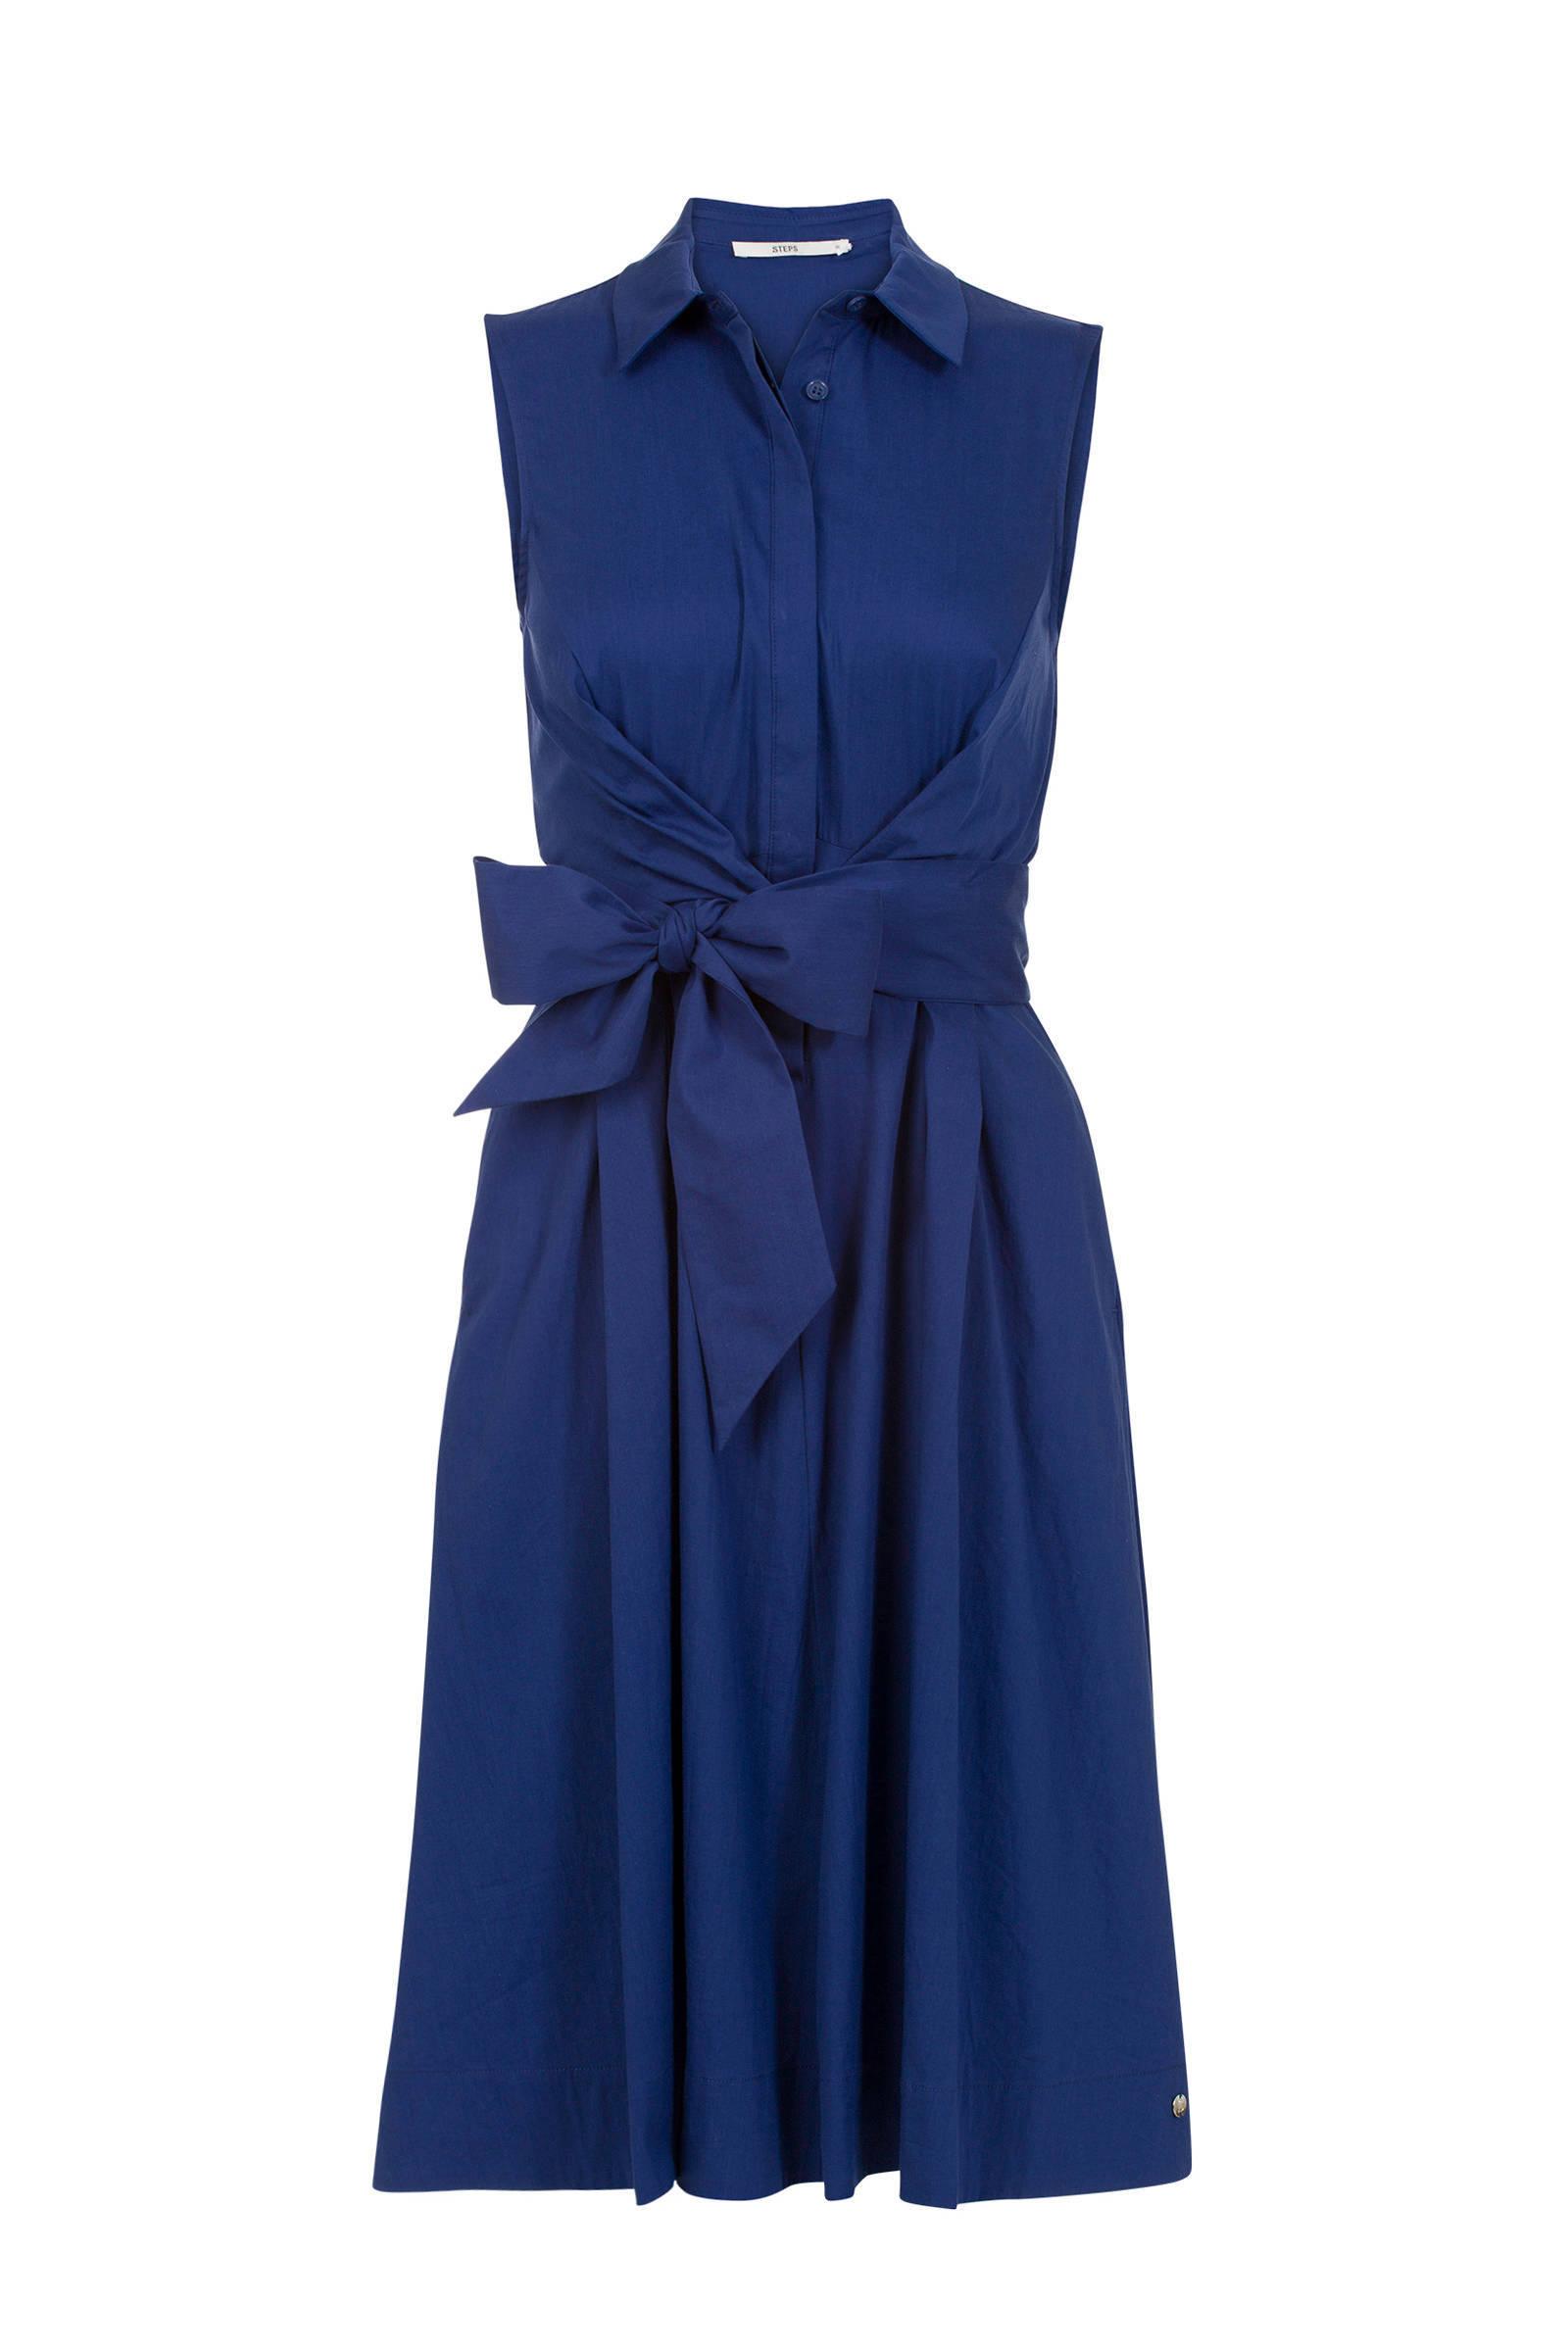 steps jurk blauw